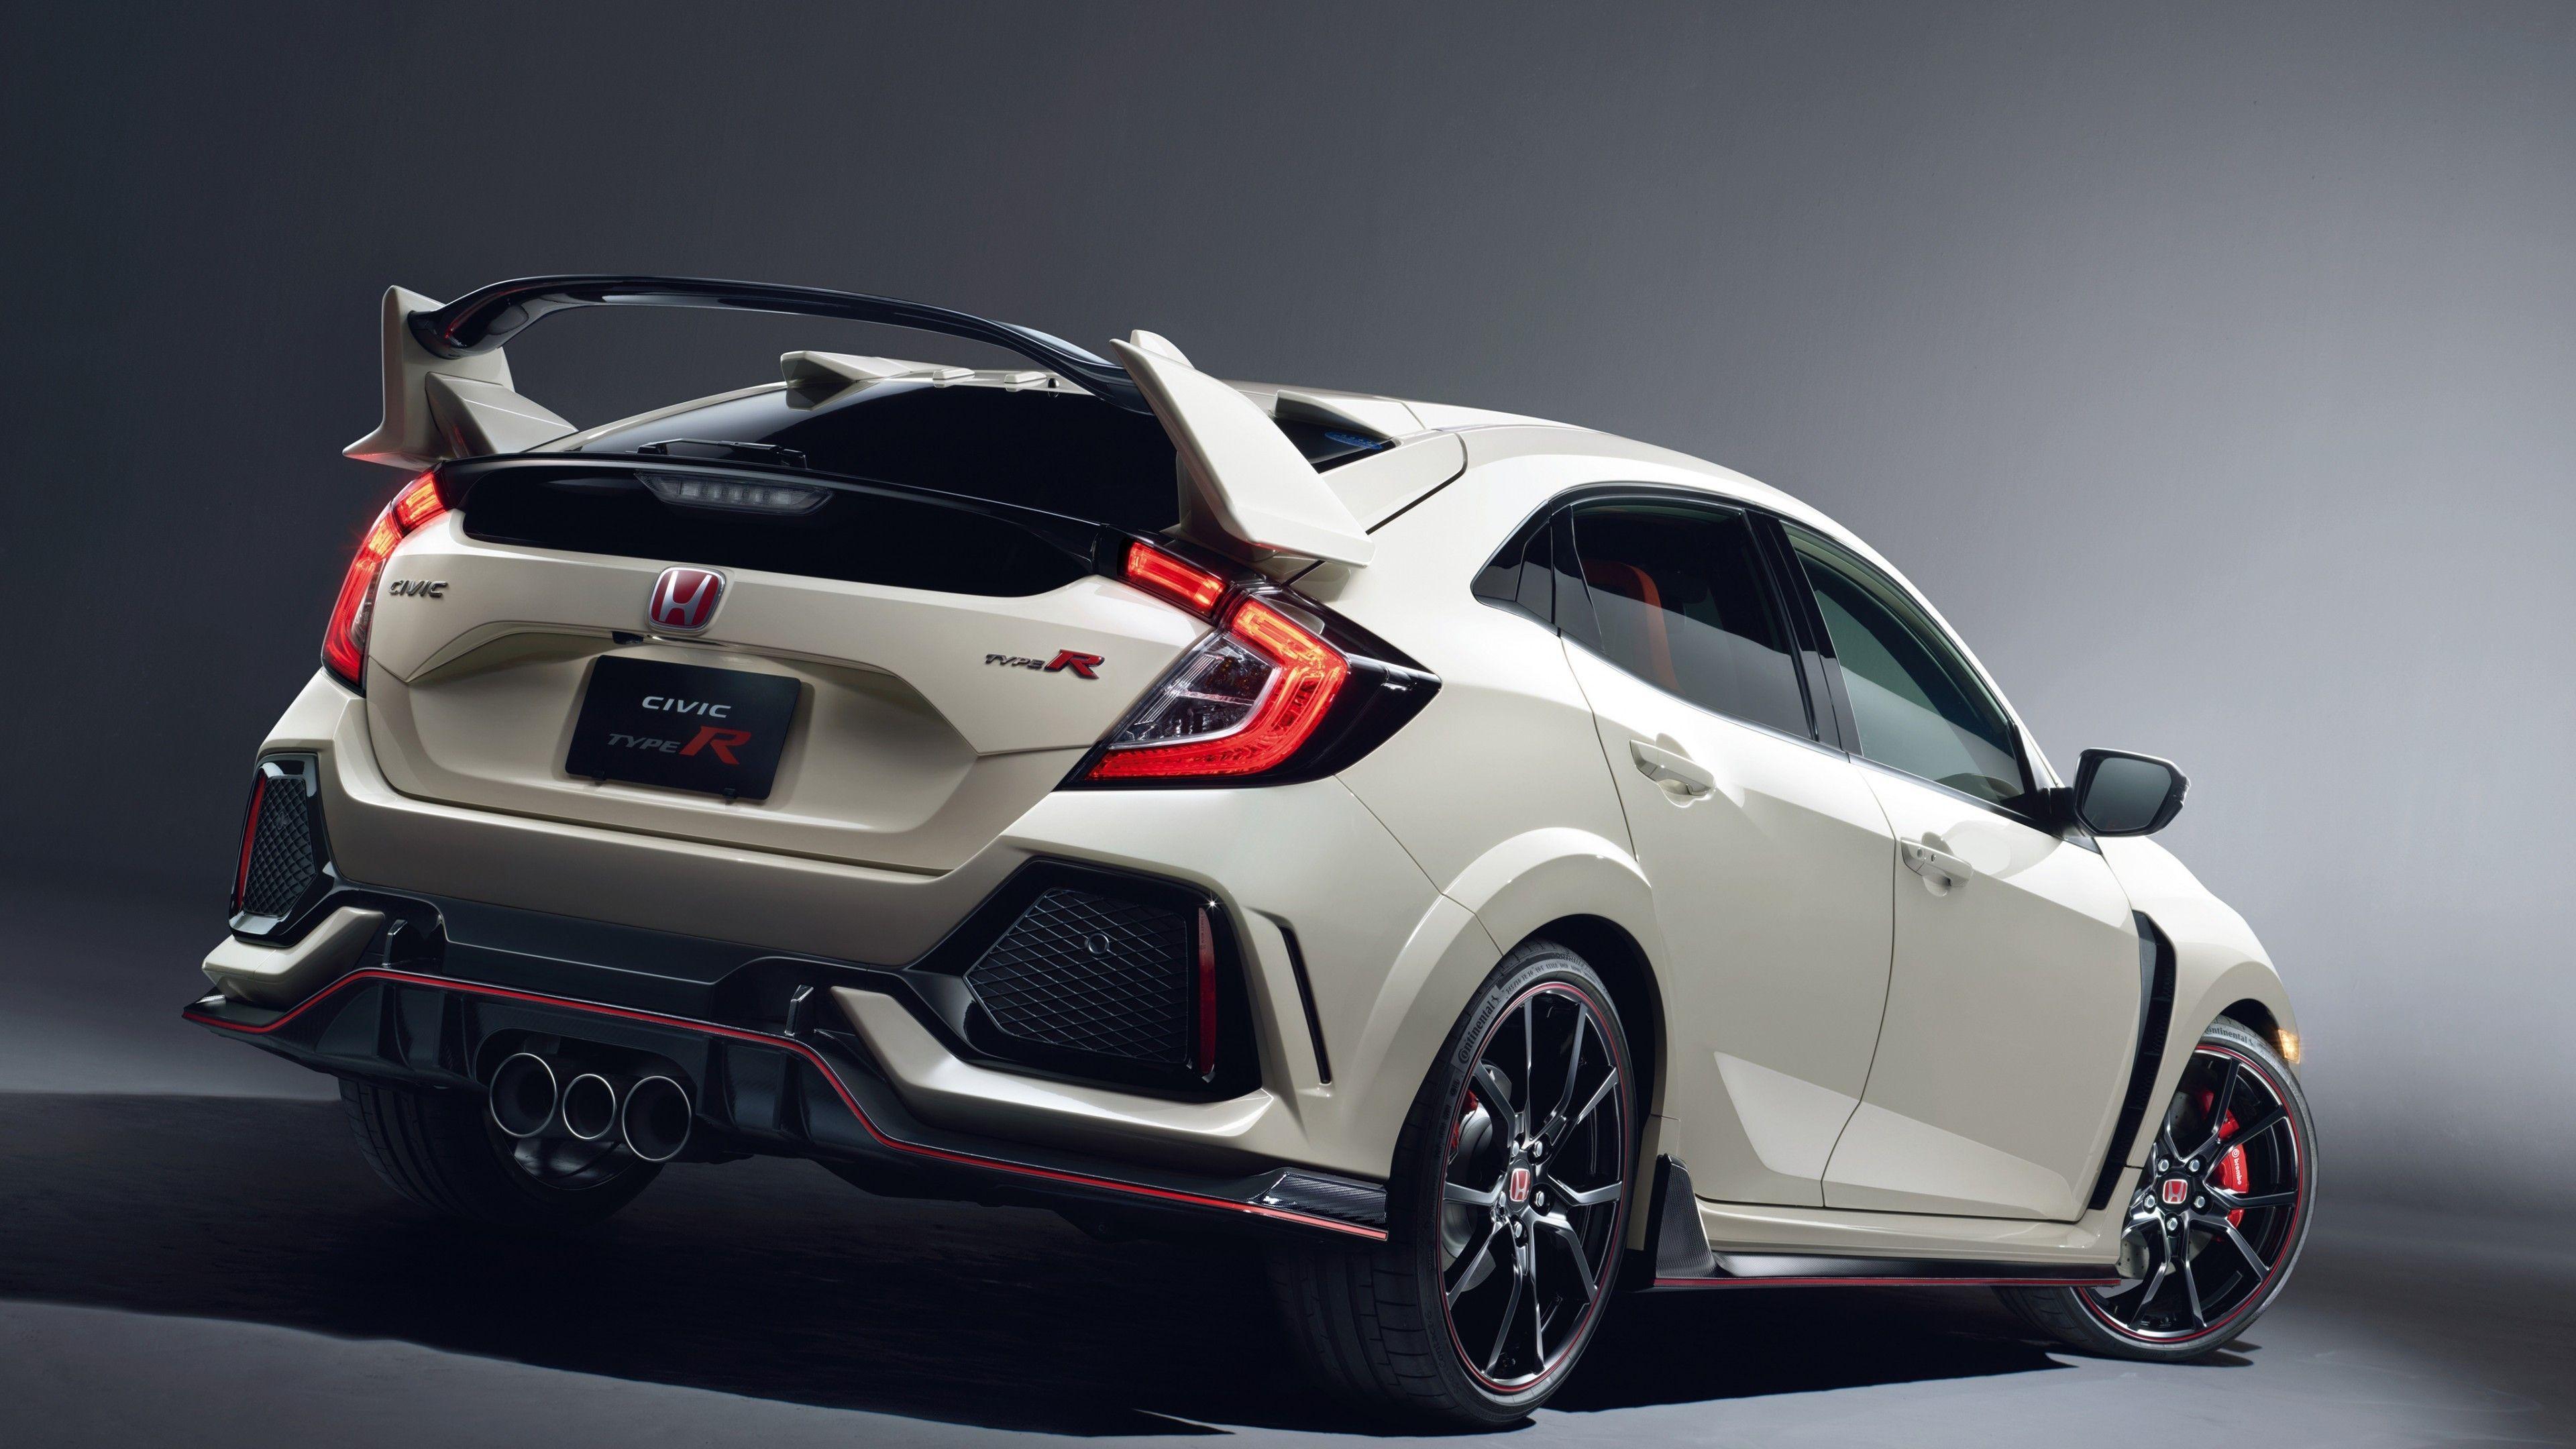 2020 Honda Civic Si Type R Honda civic, Honda civic type